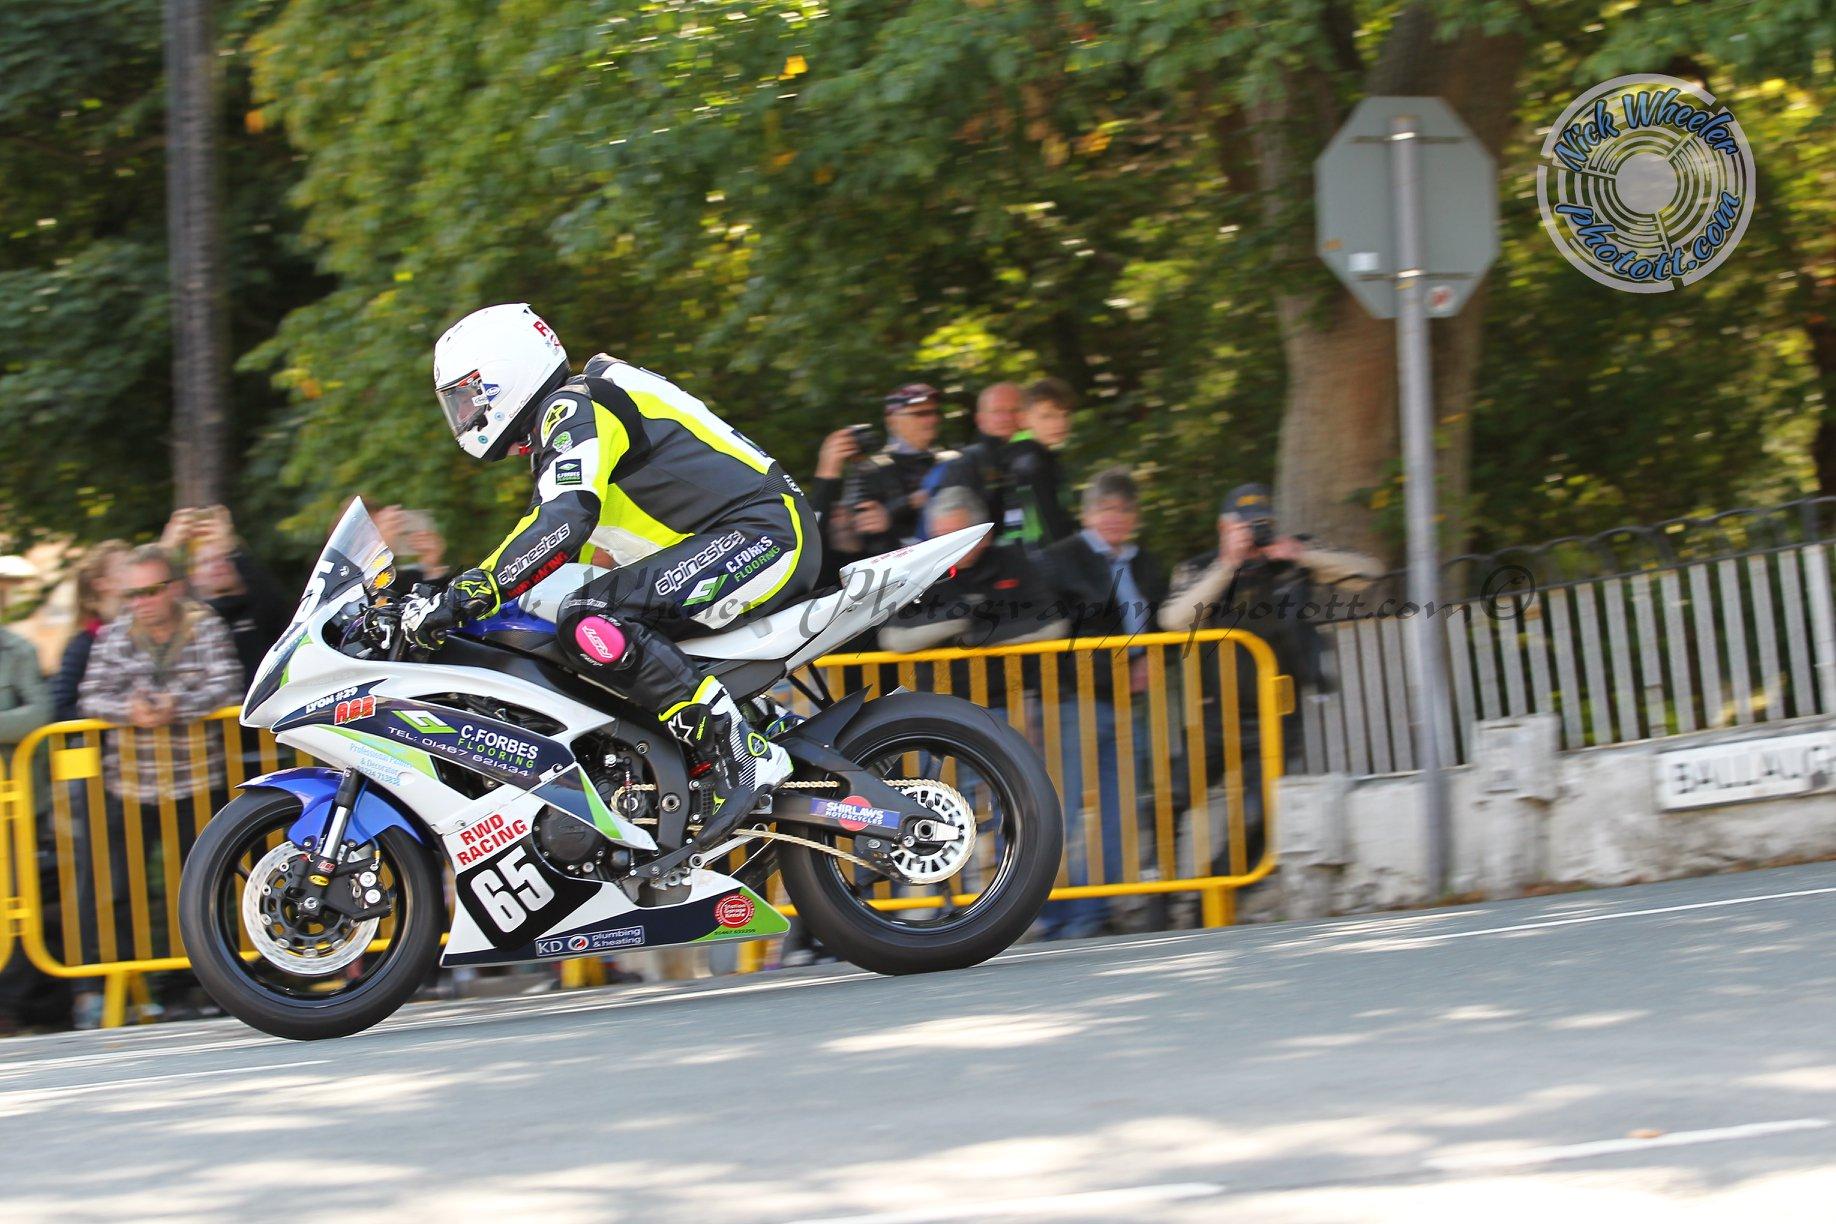 Manx GP Top 6: Richard Duncan